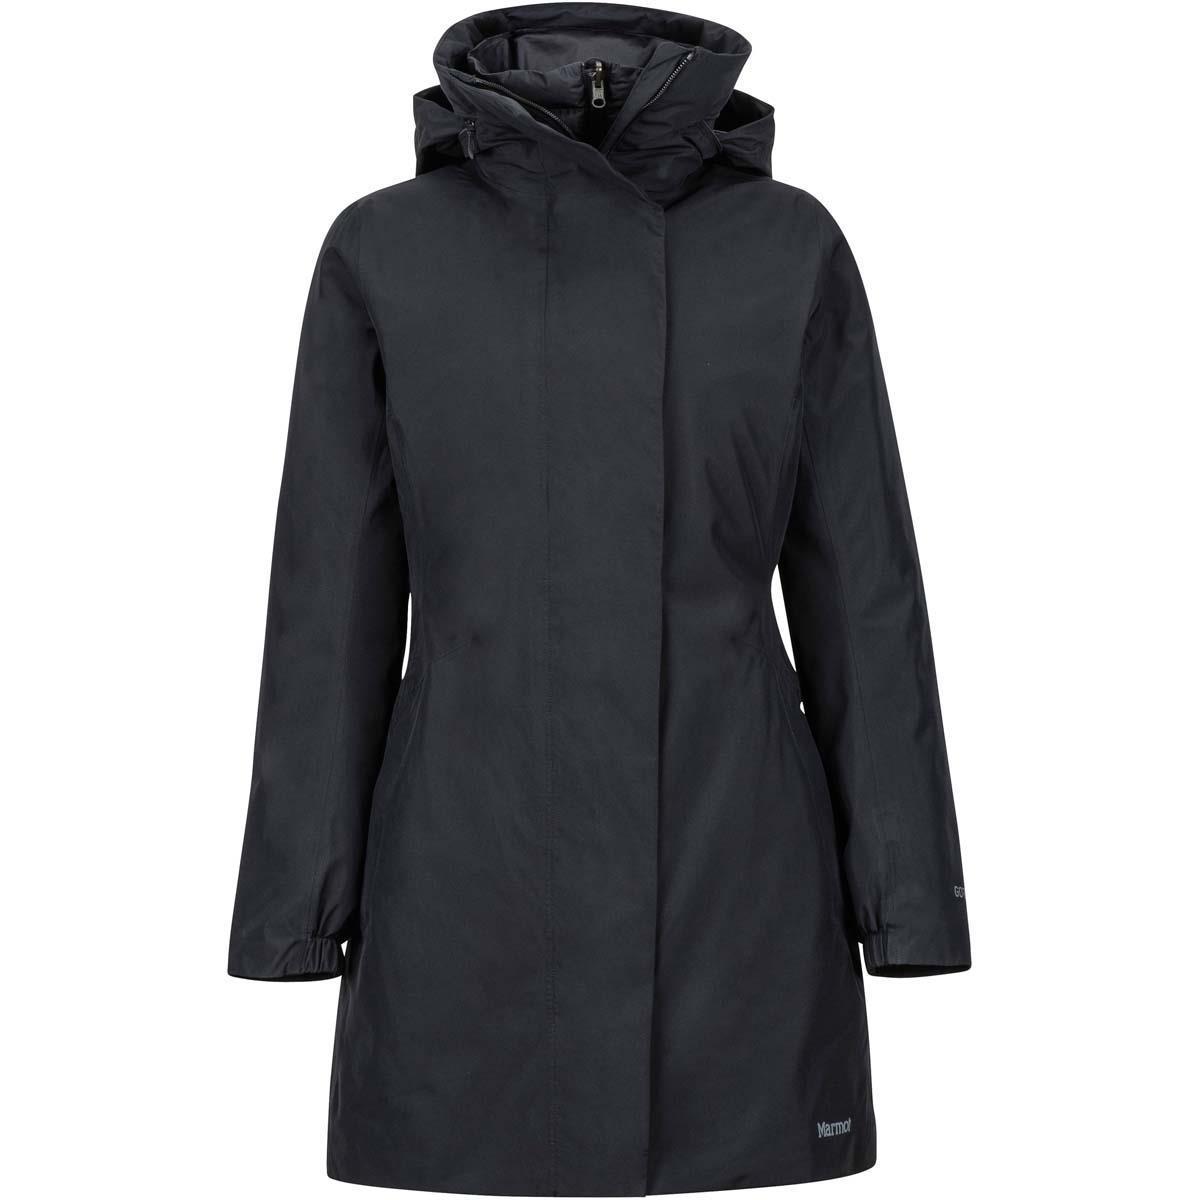 Marmot West Side Comp Jacket Womens. Loading zoom df57c8e3c9